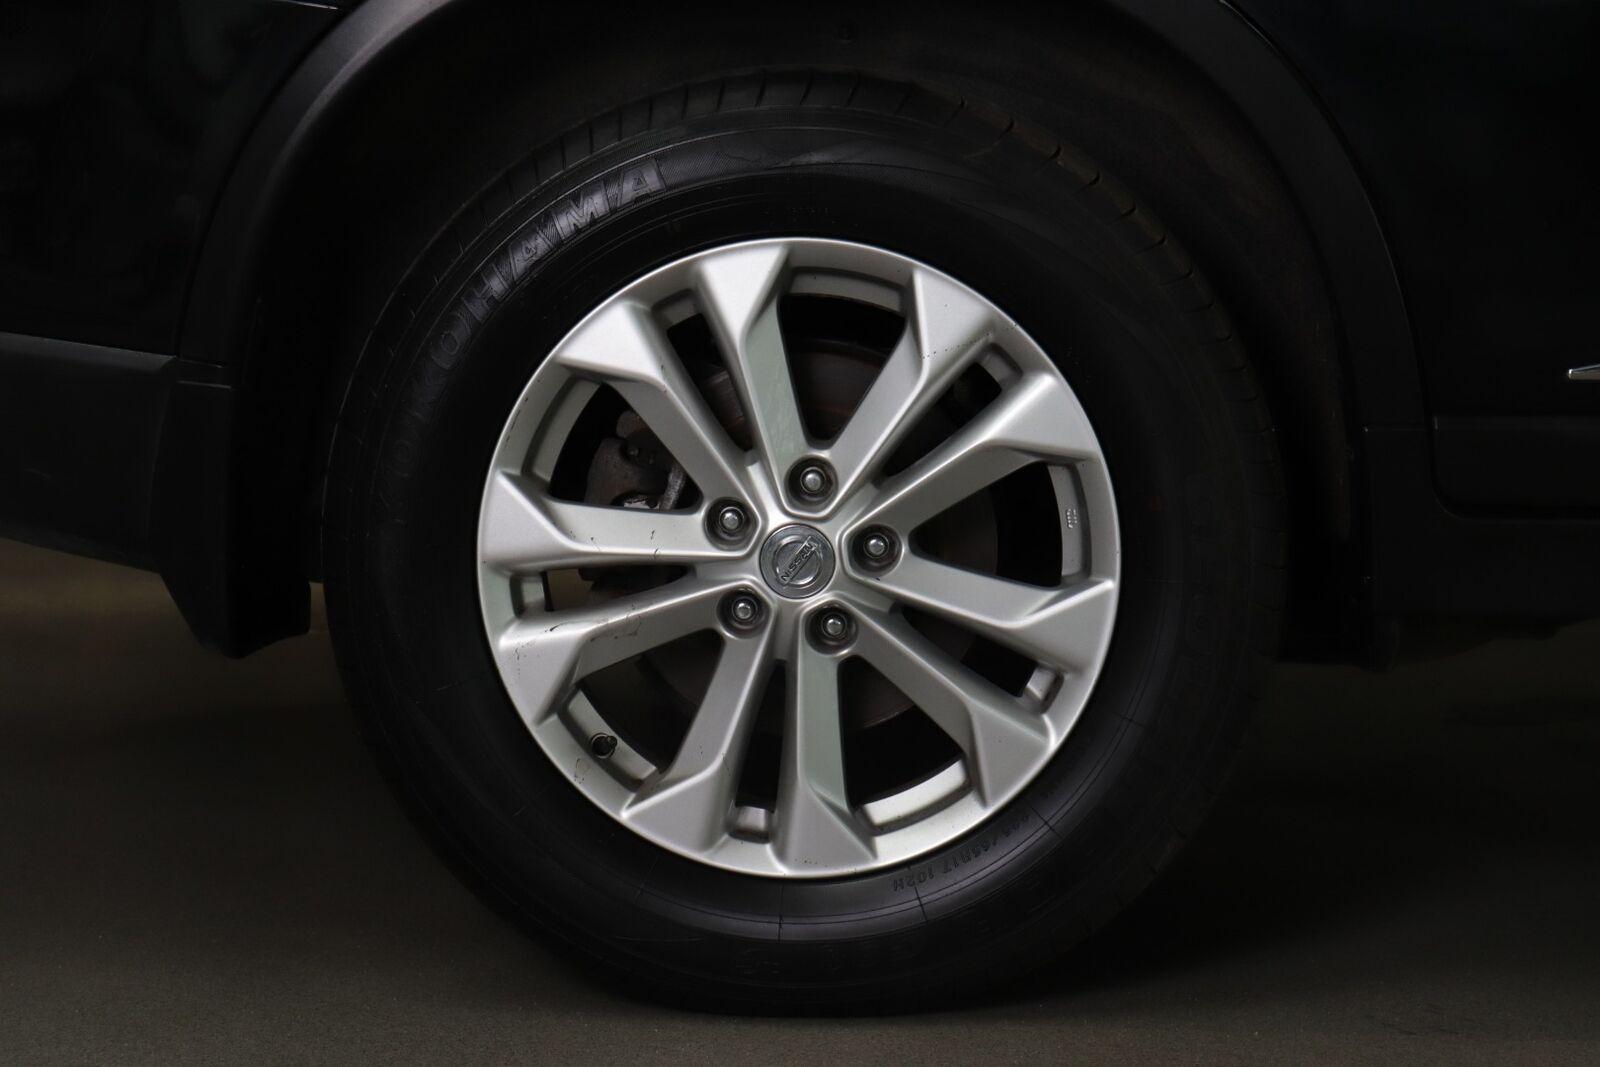 Nissan X-Trail dCi 130 Visia